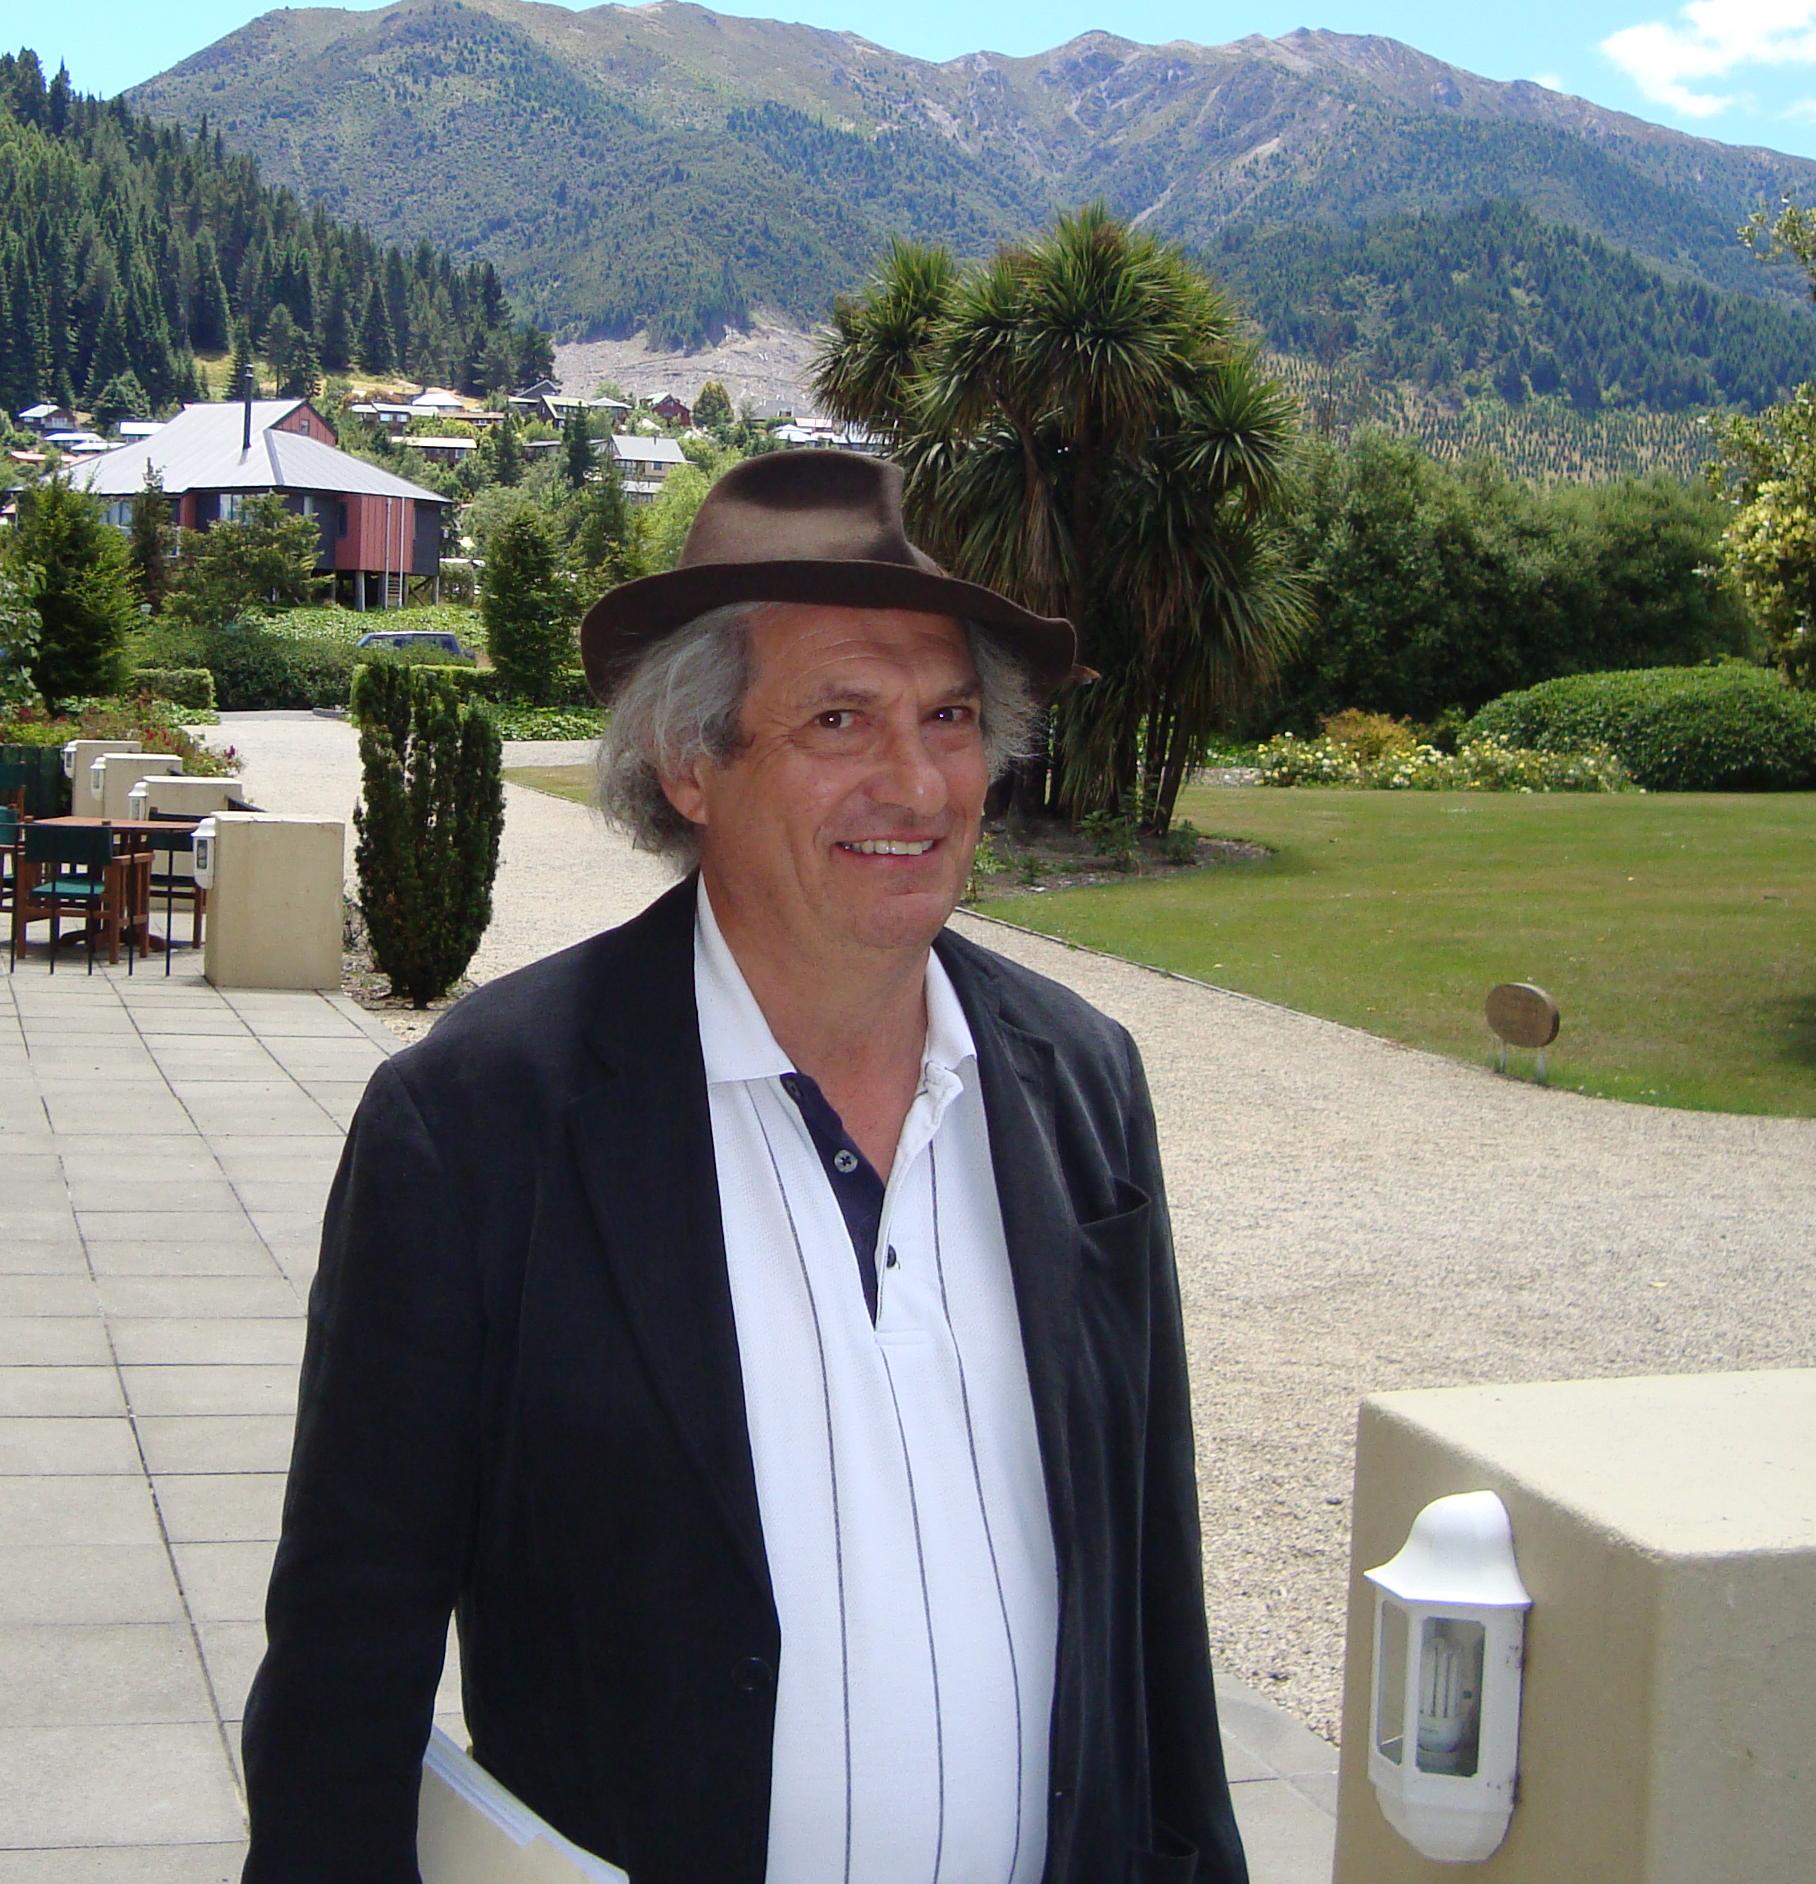 Persi Diaconis, 2010